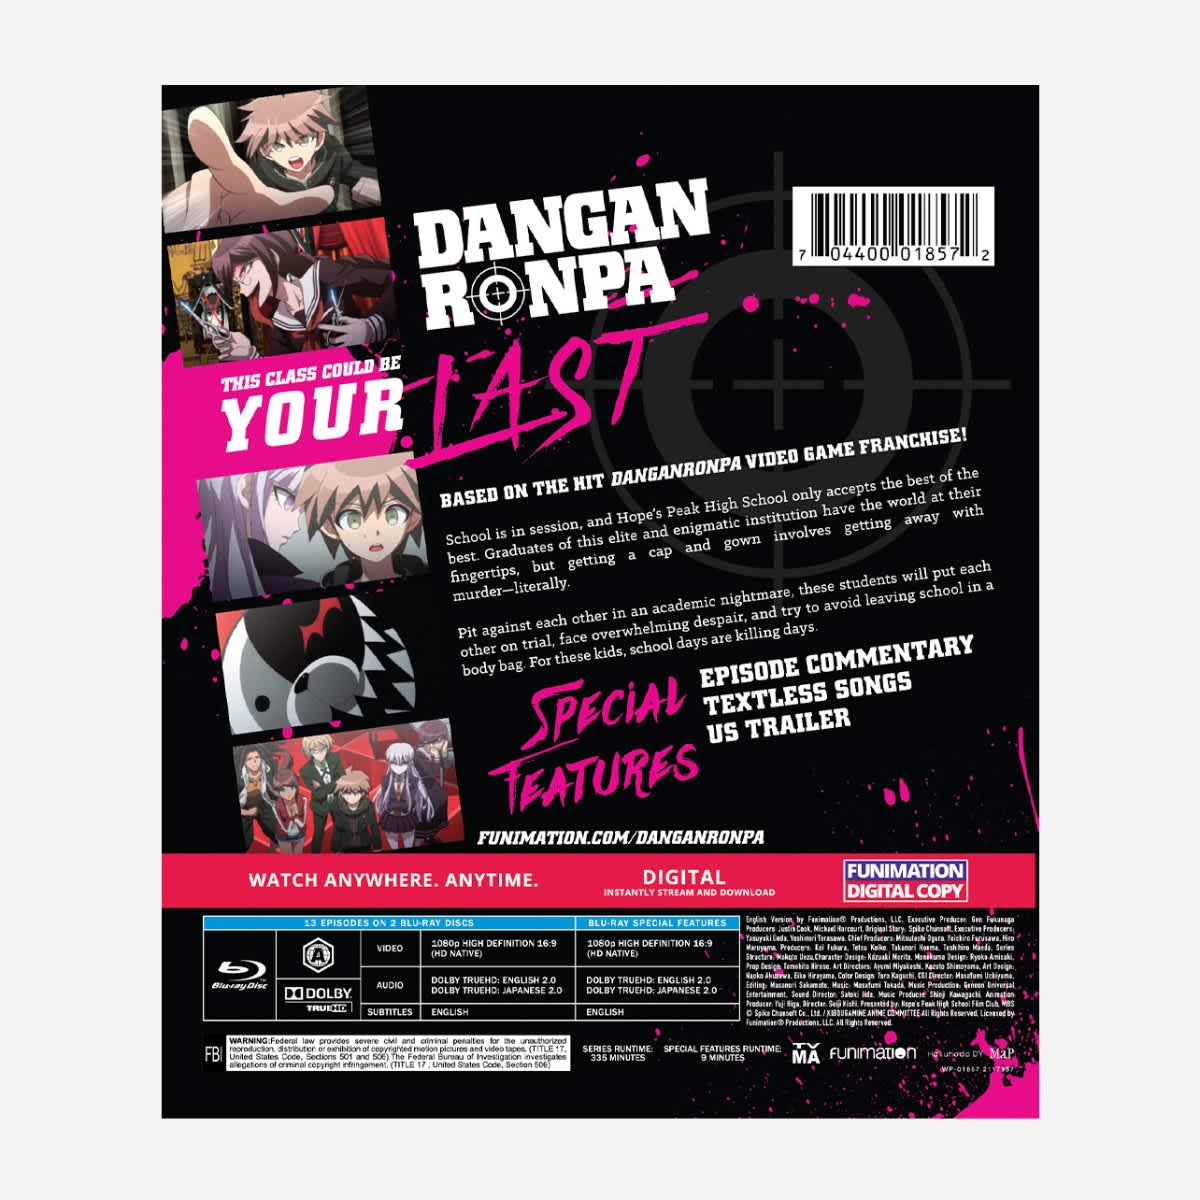 Danganronpa Essentials Blu-ray